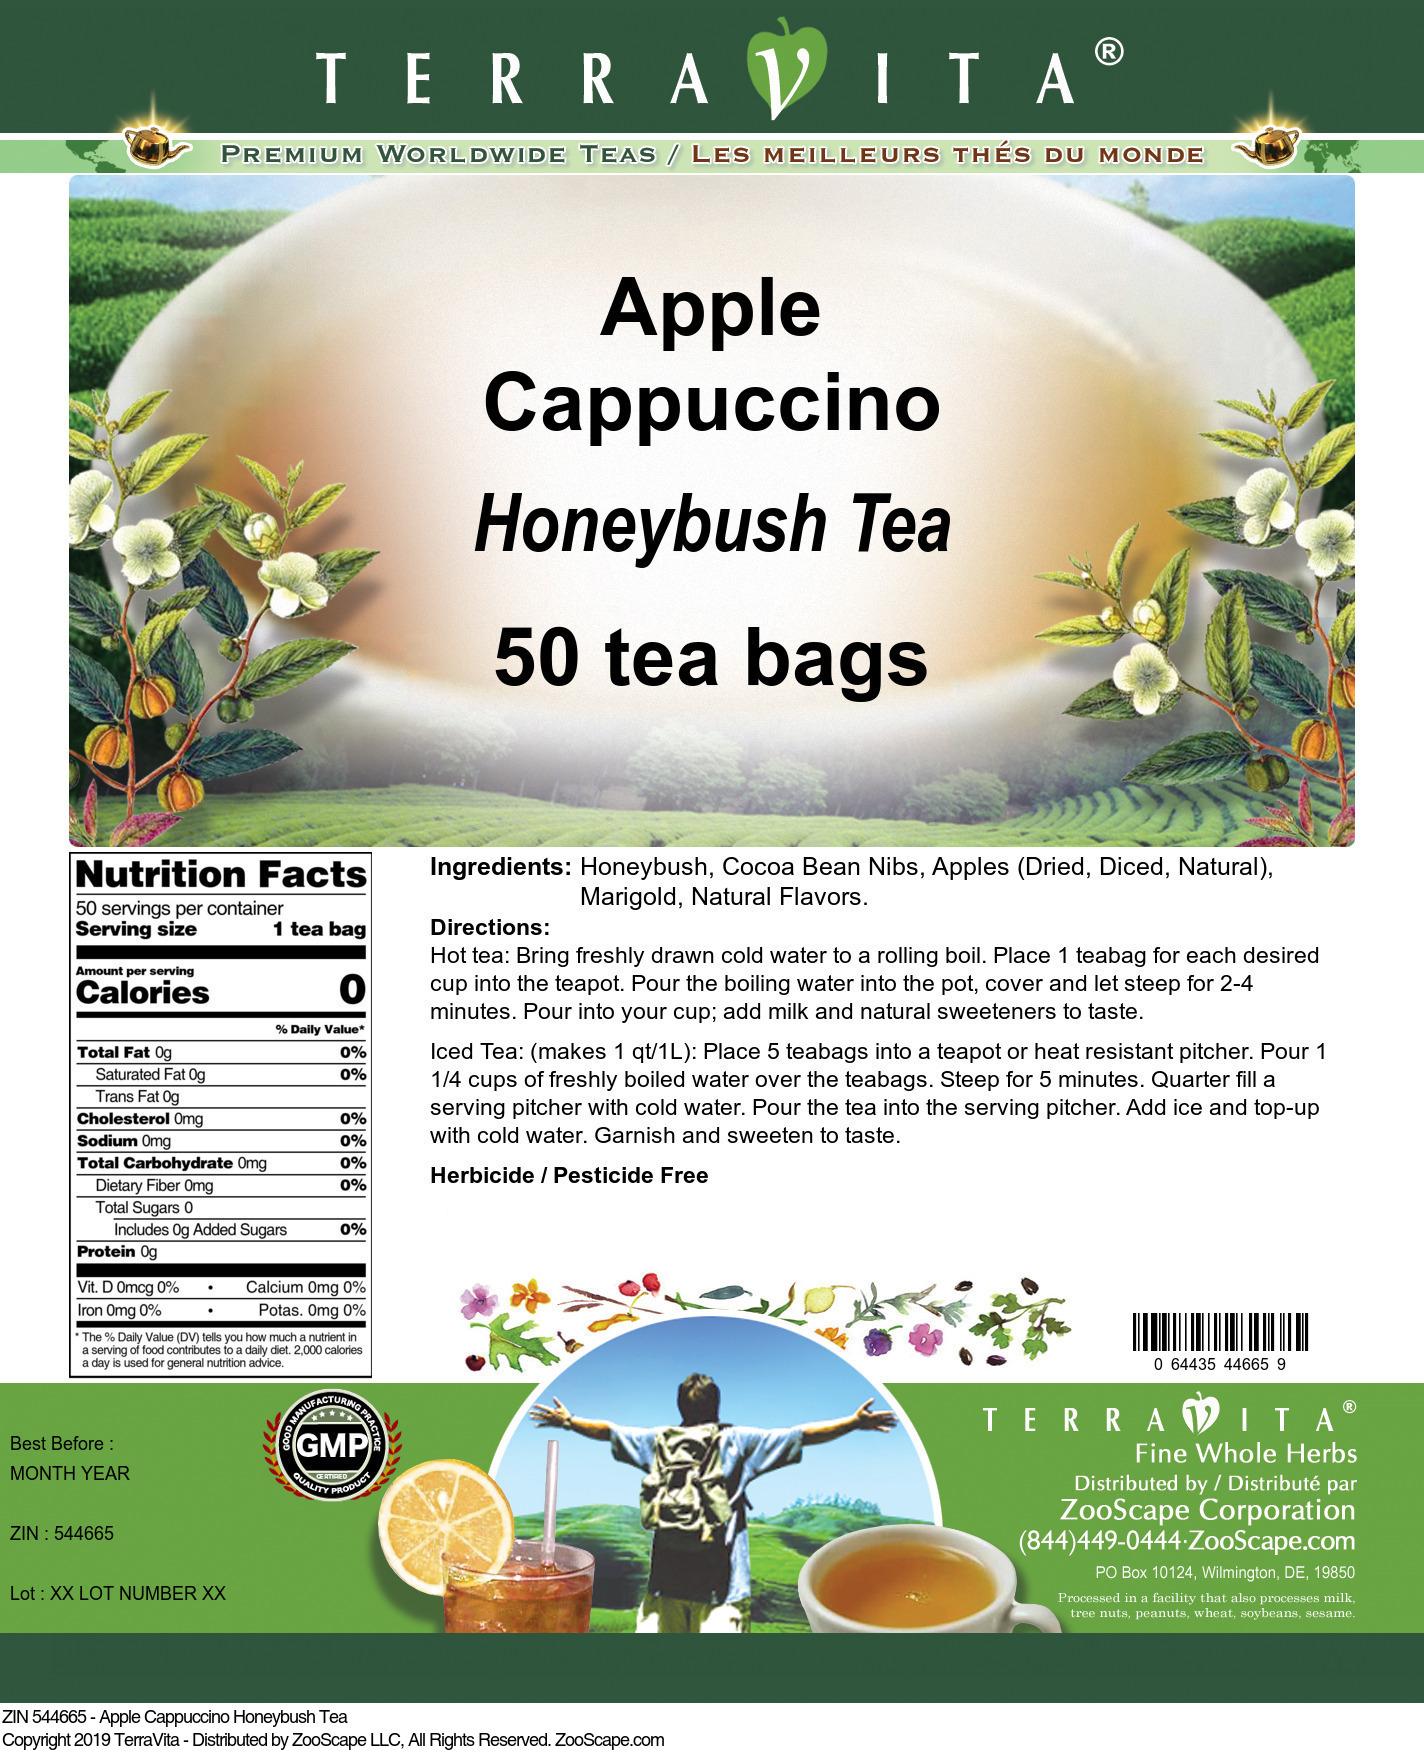 Apple Cappuccino Honeybush Tea